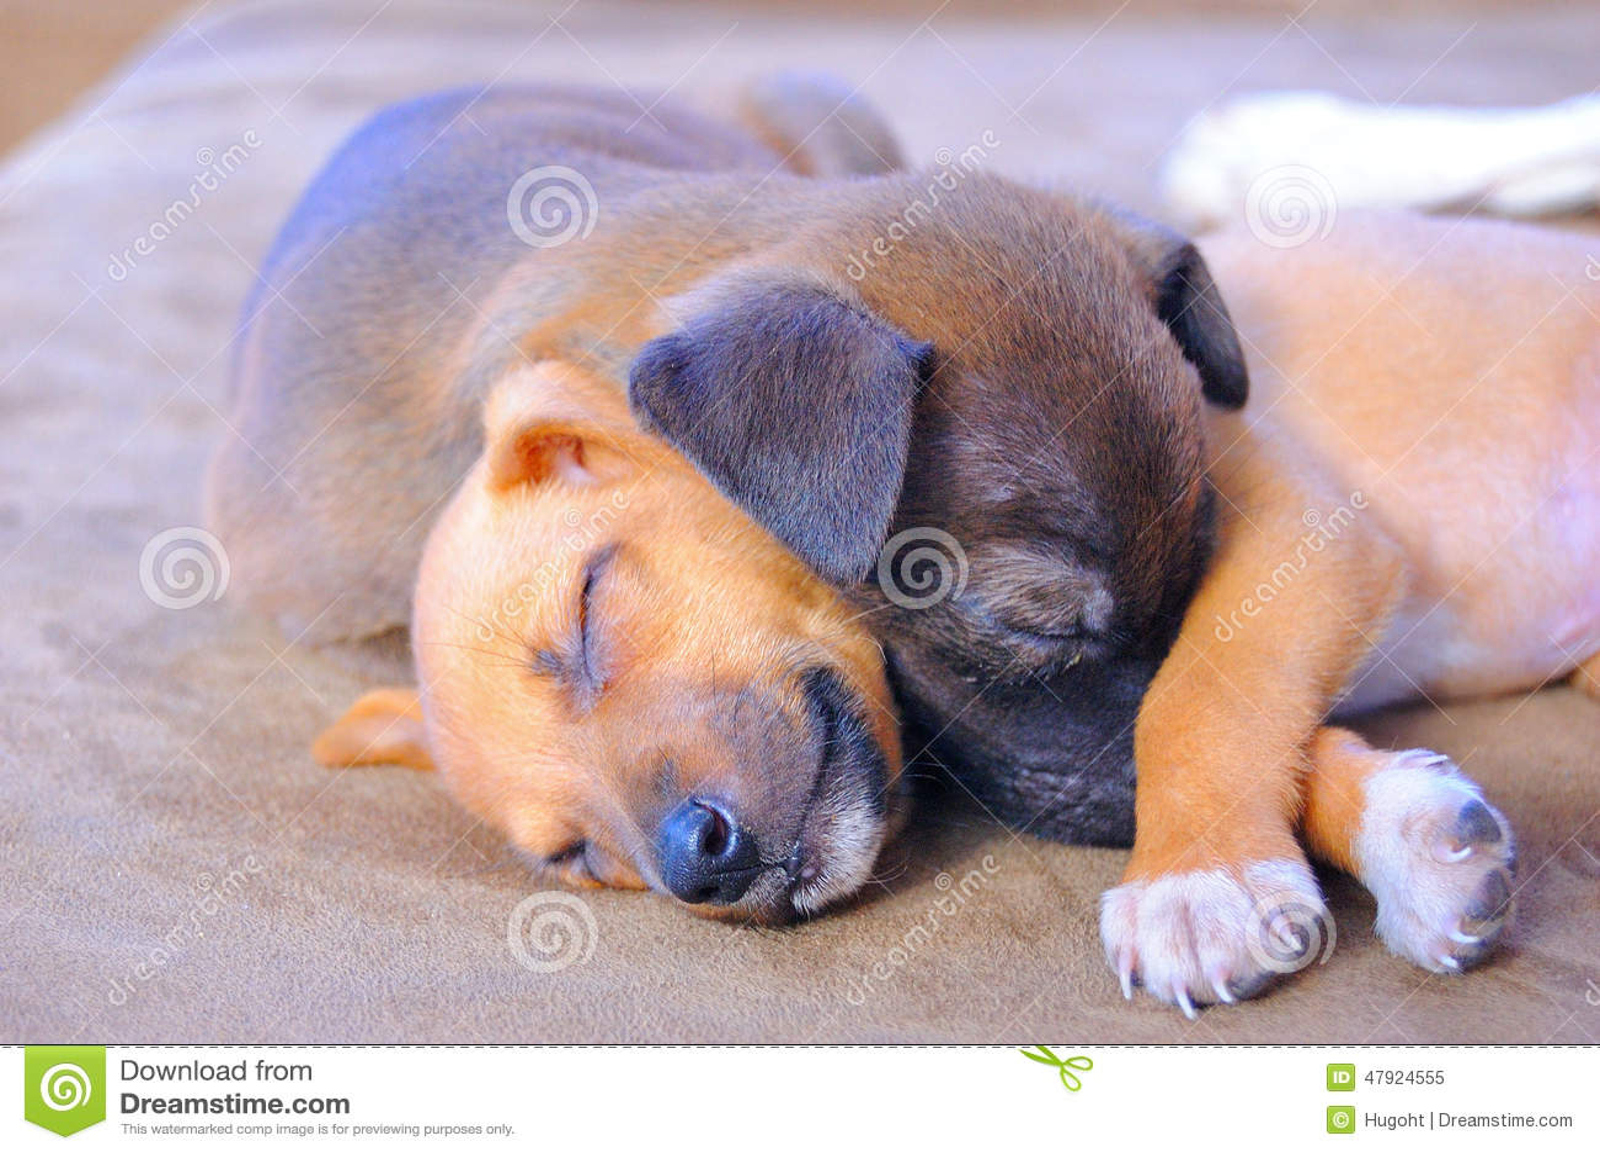 Adorable Puppies Sleeping Stock Image